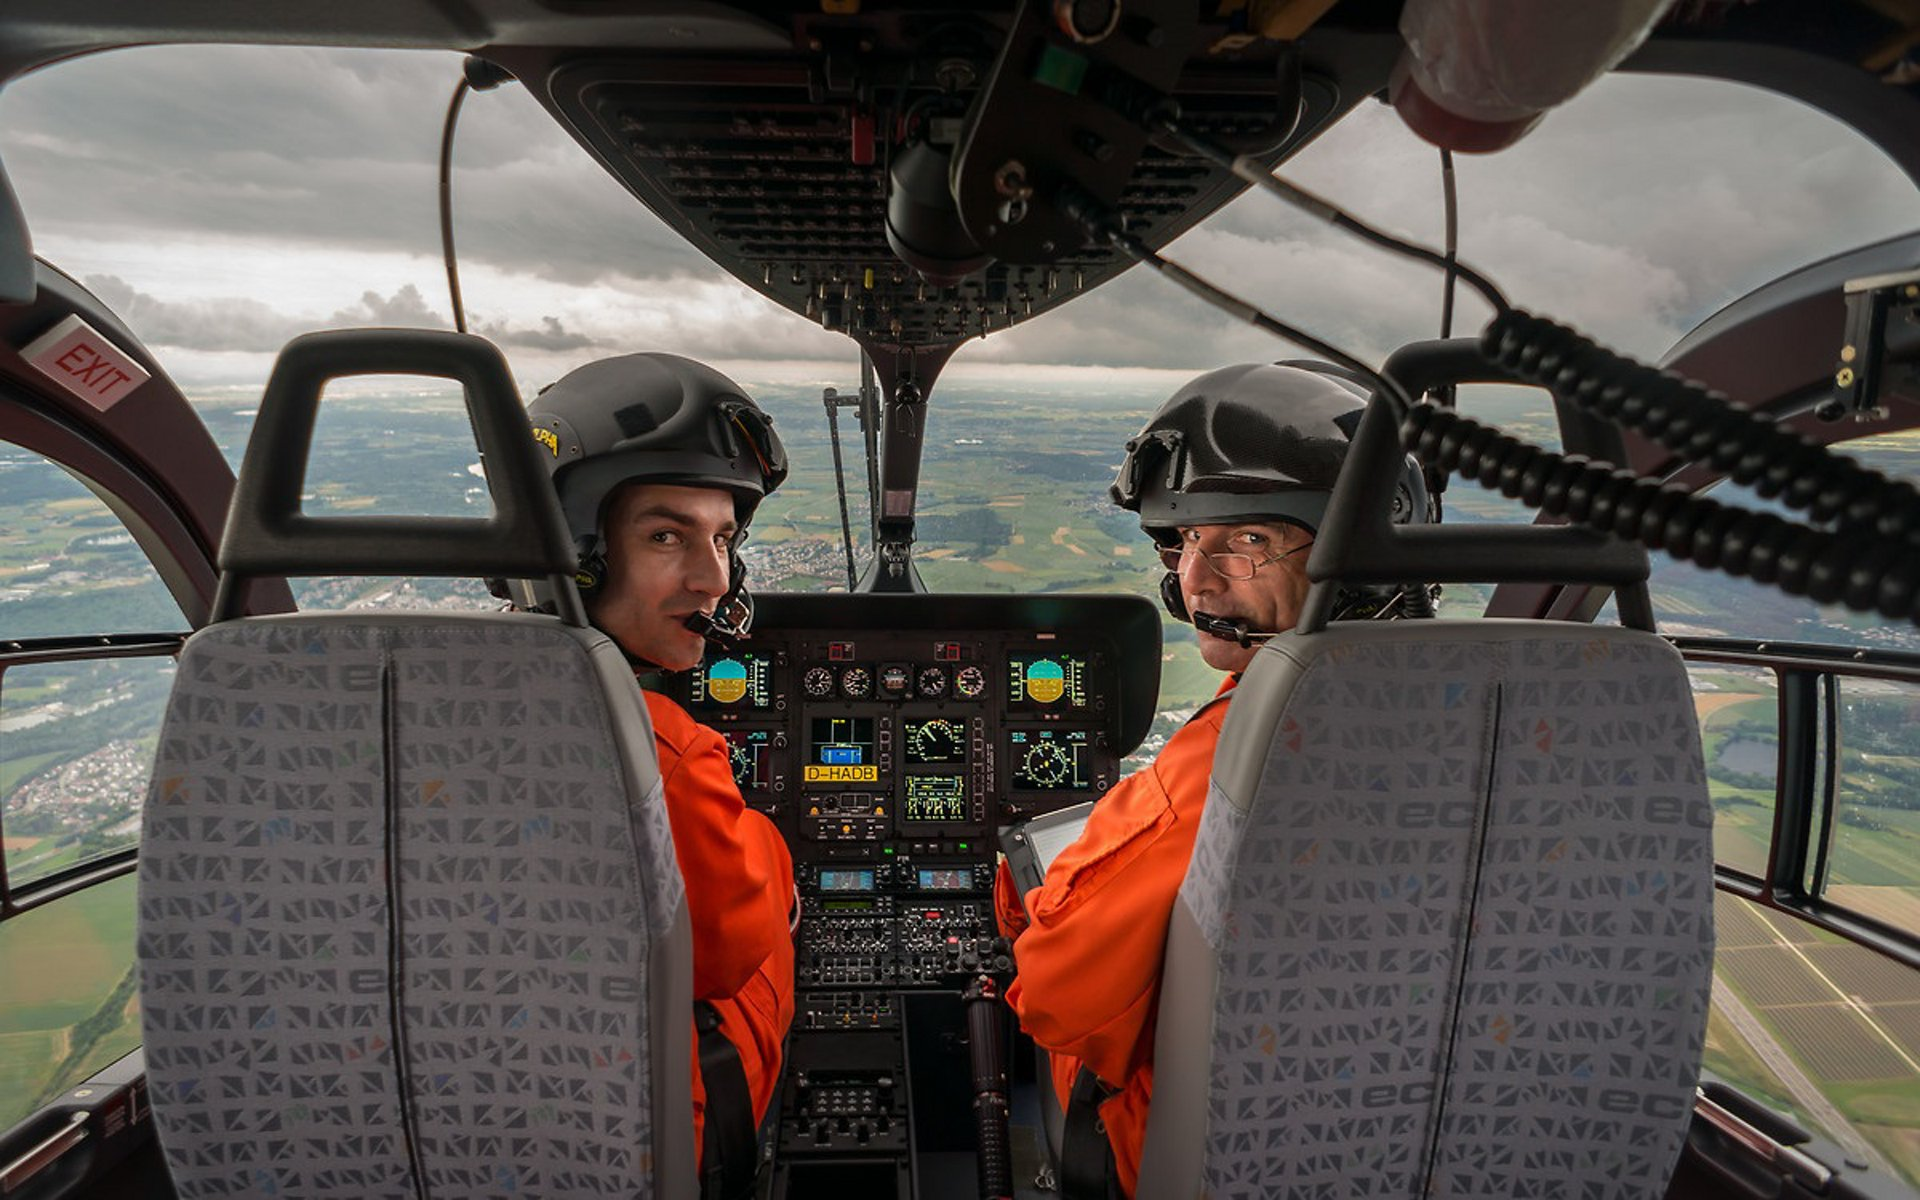 Flighttraining courses